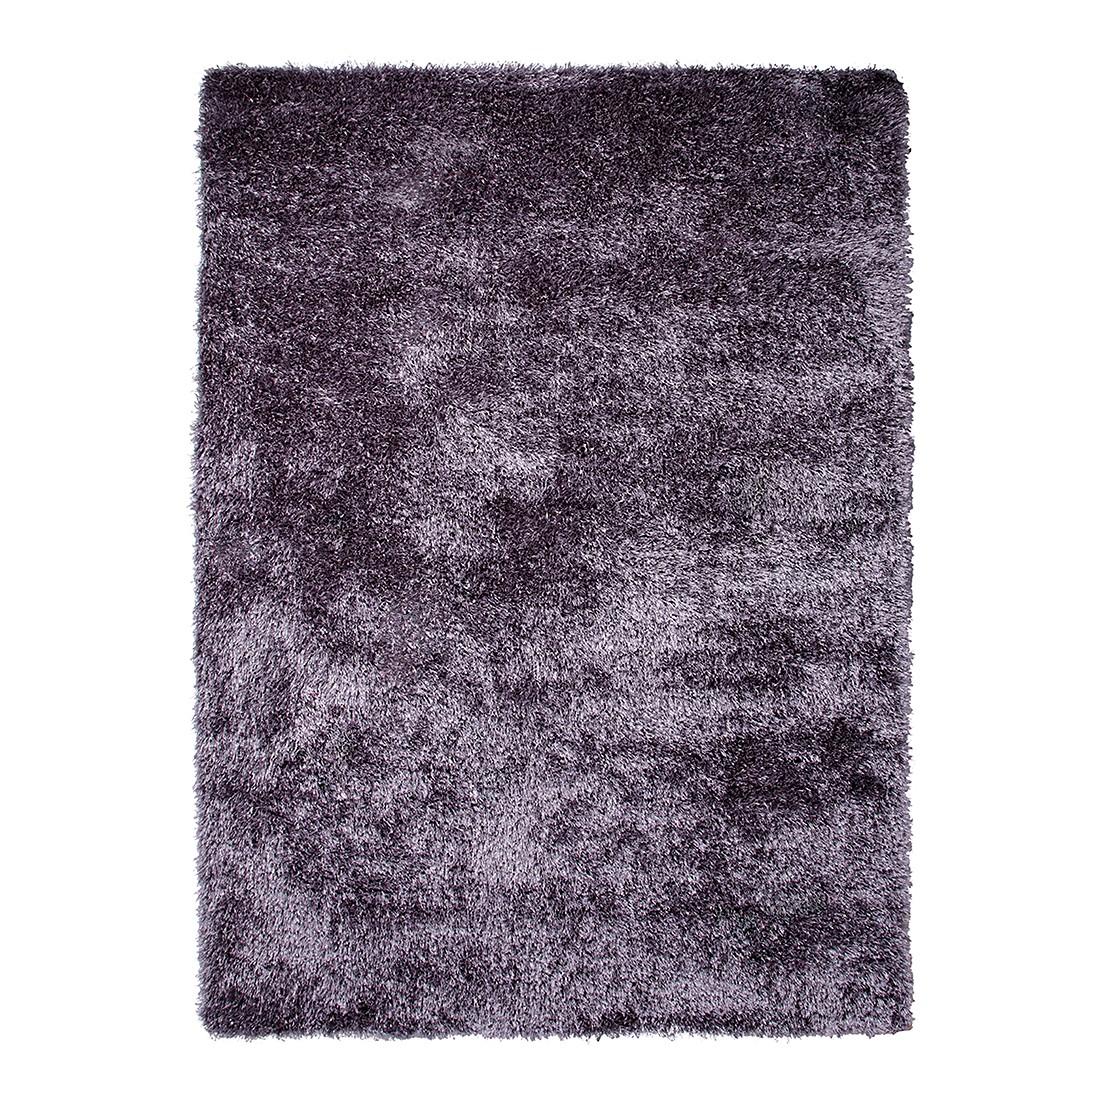 Vloerkleed New Glamour - grijs - Aubergine - 70x140cm, Esprit Home